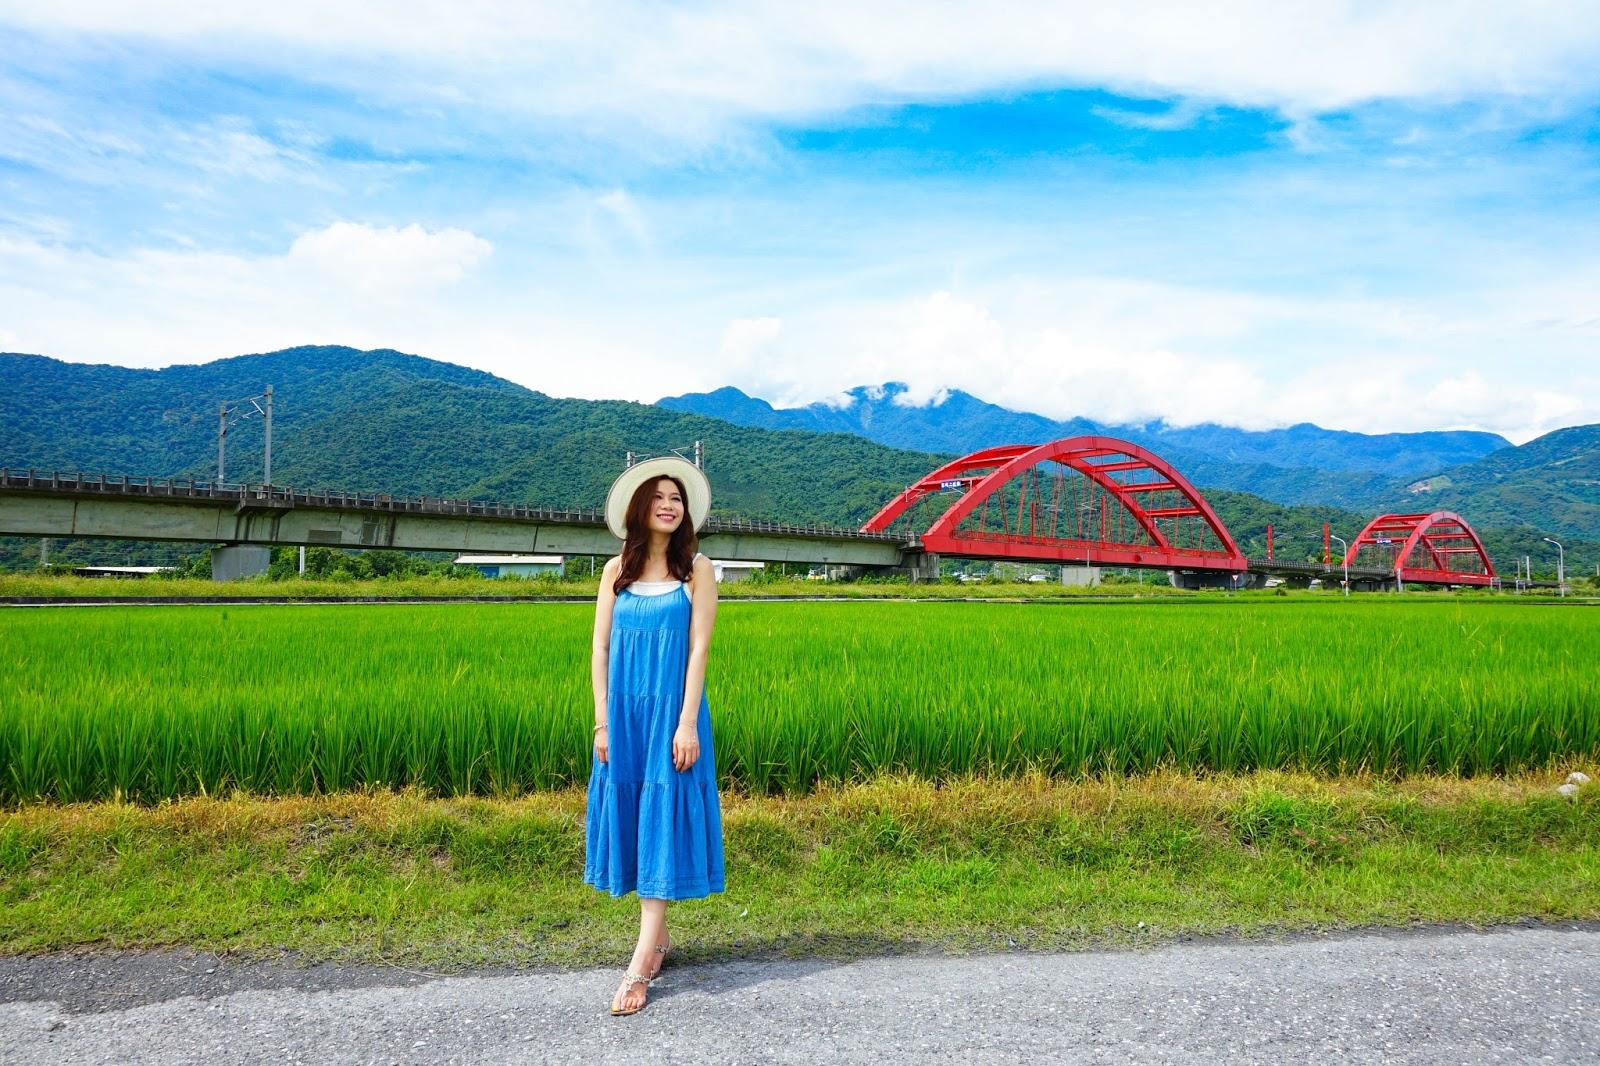 beautyanxiety.com-beautyanxiety.com-yuli-bridge-%25E7%258E%2589%25E9%2587%258C%25E5%25AE%25A2%25E5%259F%258E%25E9%2590%25B5%25E6%25A9%258B-DSC02127.jpg